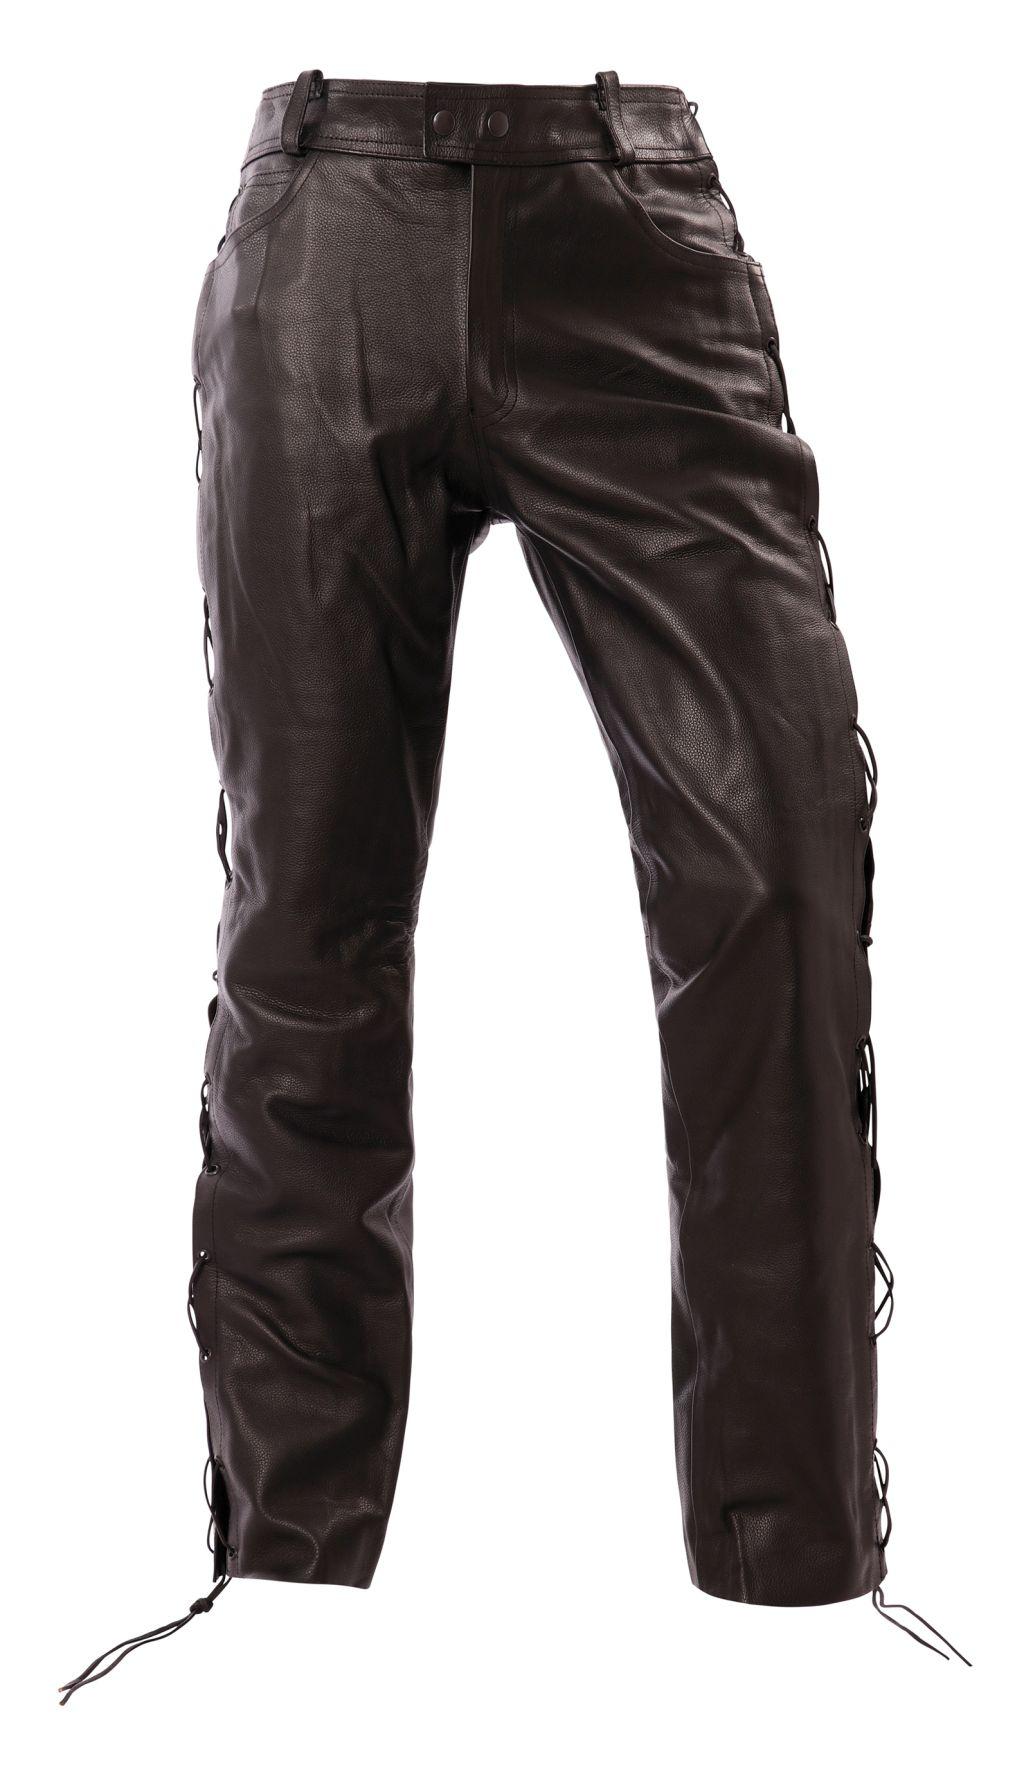 Bangla Schnürjeans Lederhose Motorrad Bikerjeans Schwarz inch 36 - 46